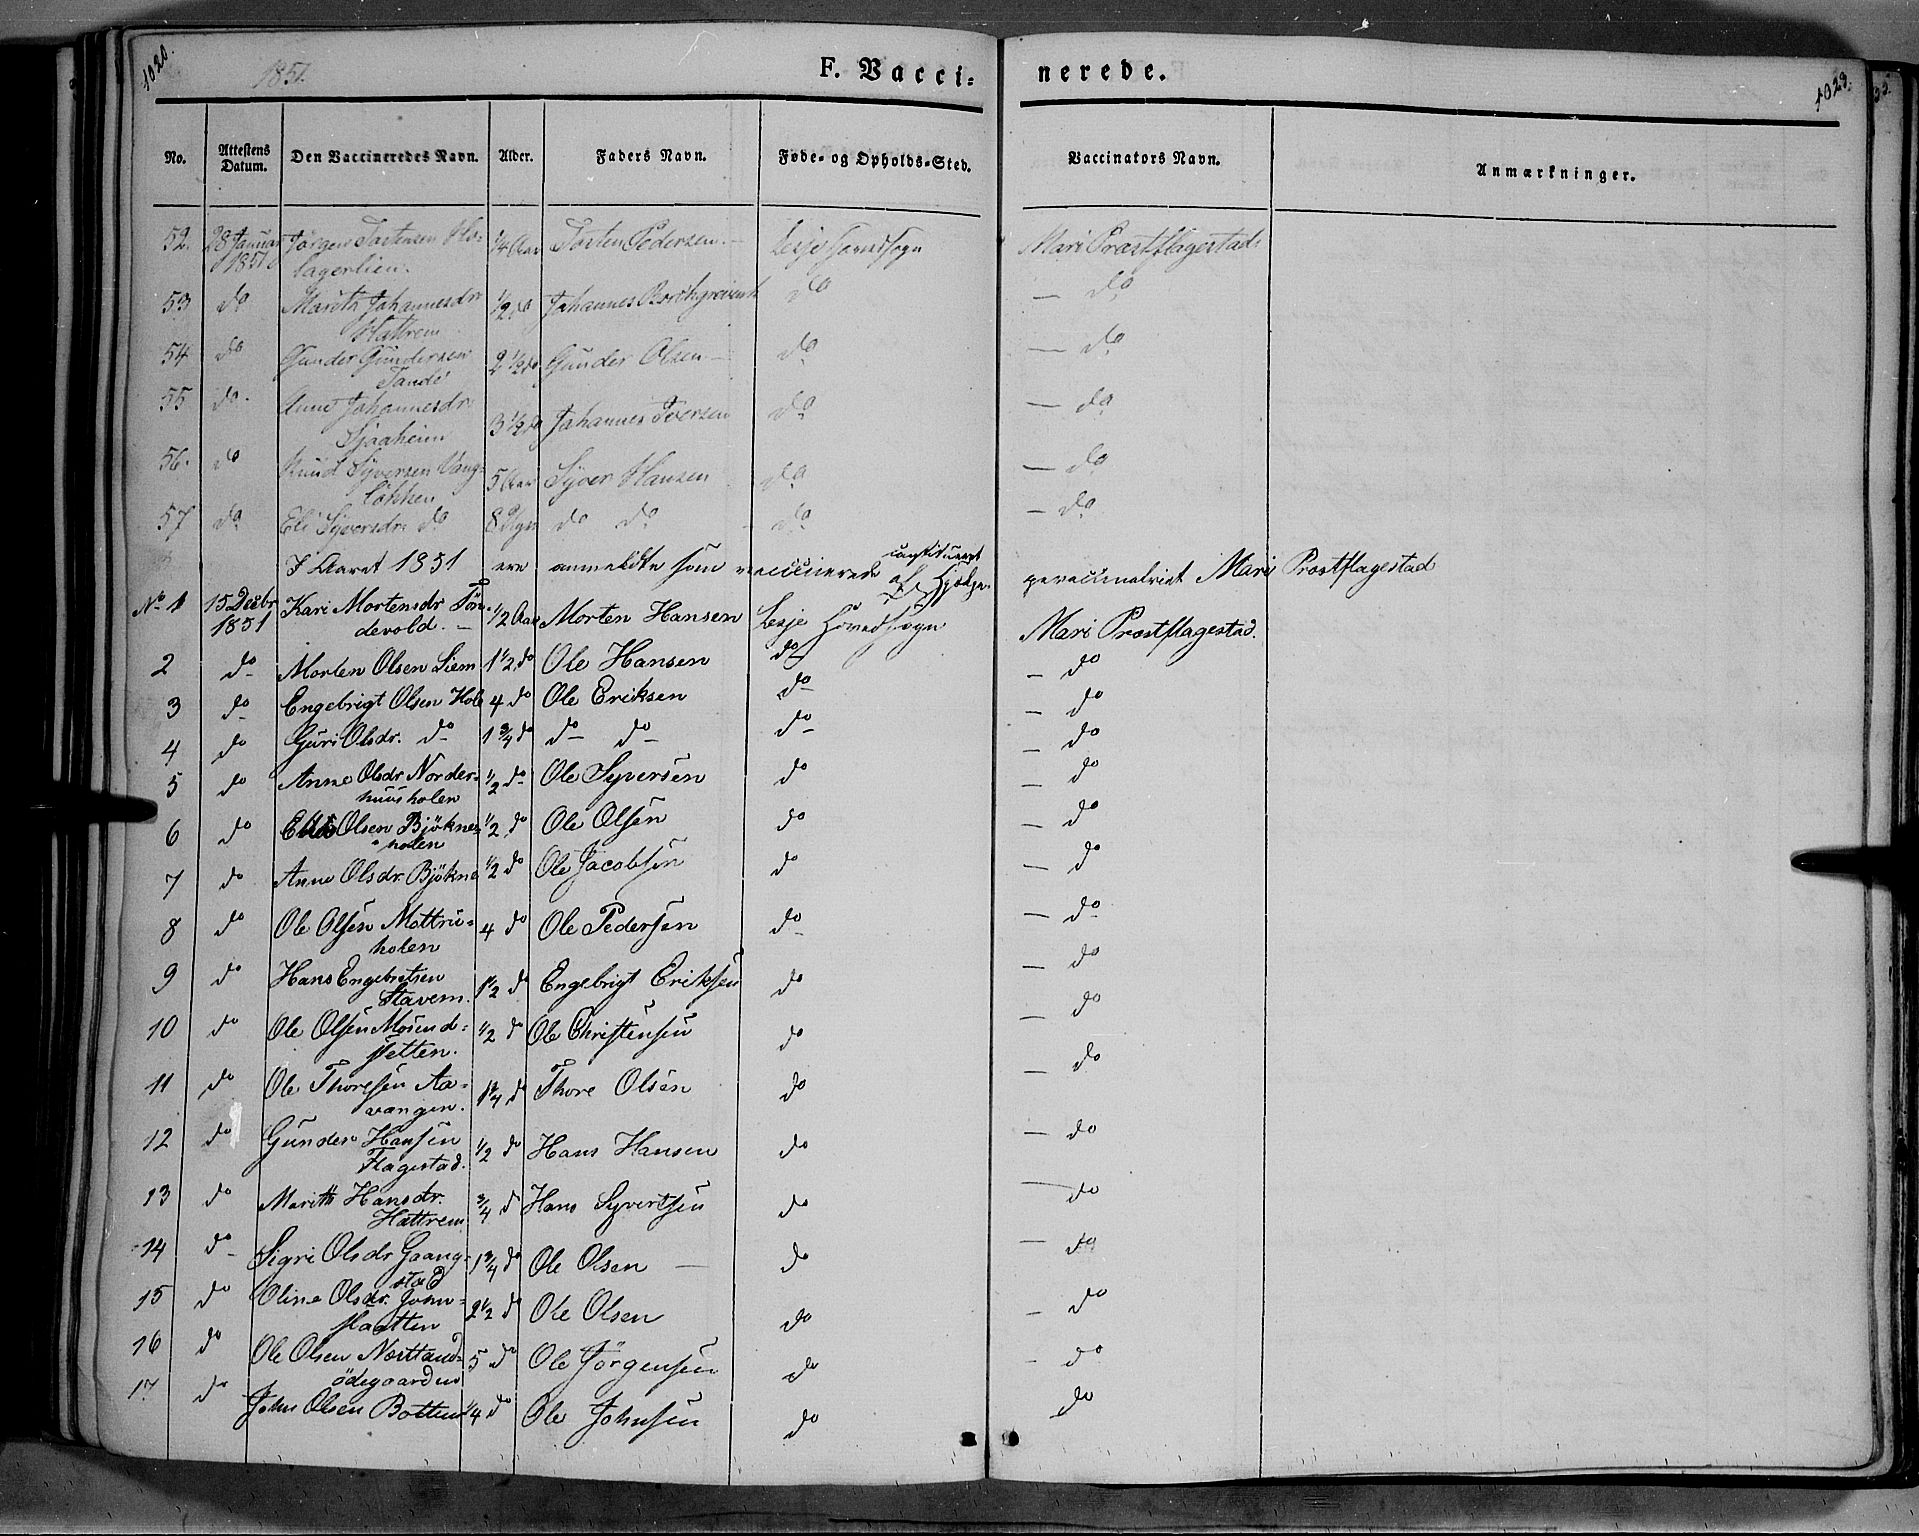 SAH, Lesja prestekontor, Ministerialbok nr. 6B, 1843-1854, s. 1022-1023